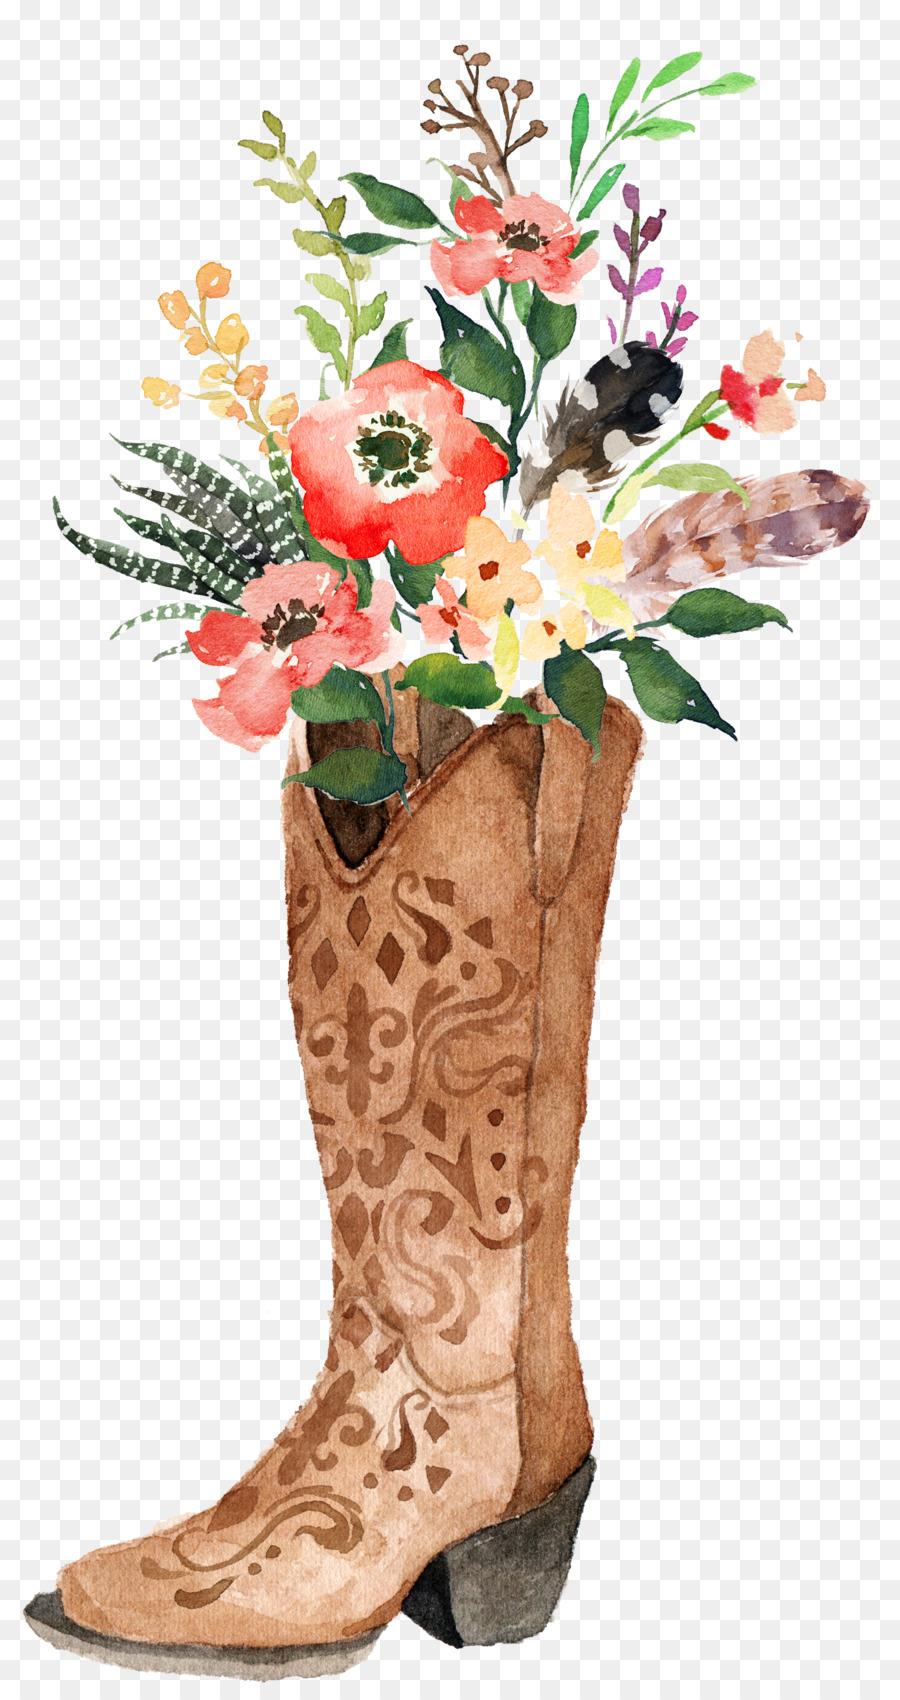 900x1700 Cowboy Boot Watercolor Painting Boho Chic